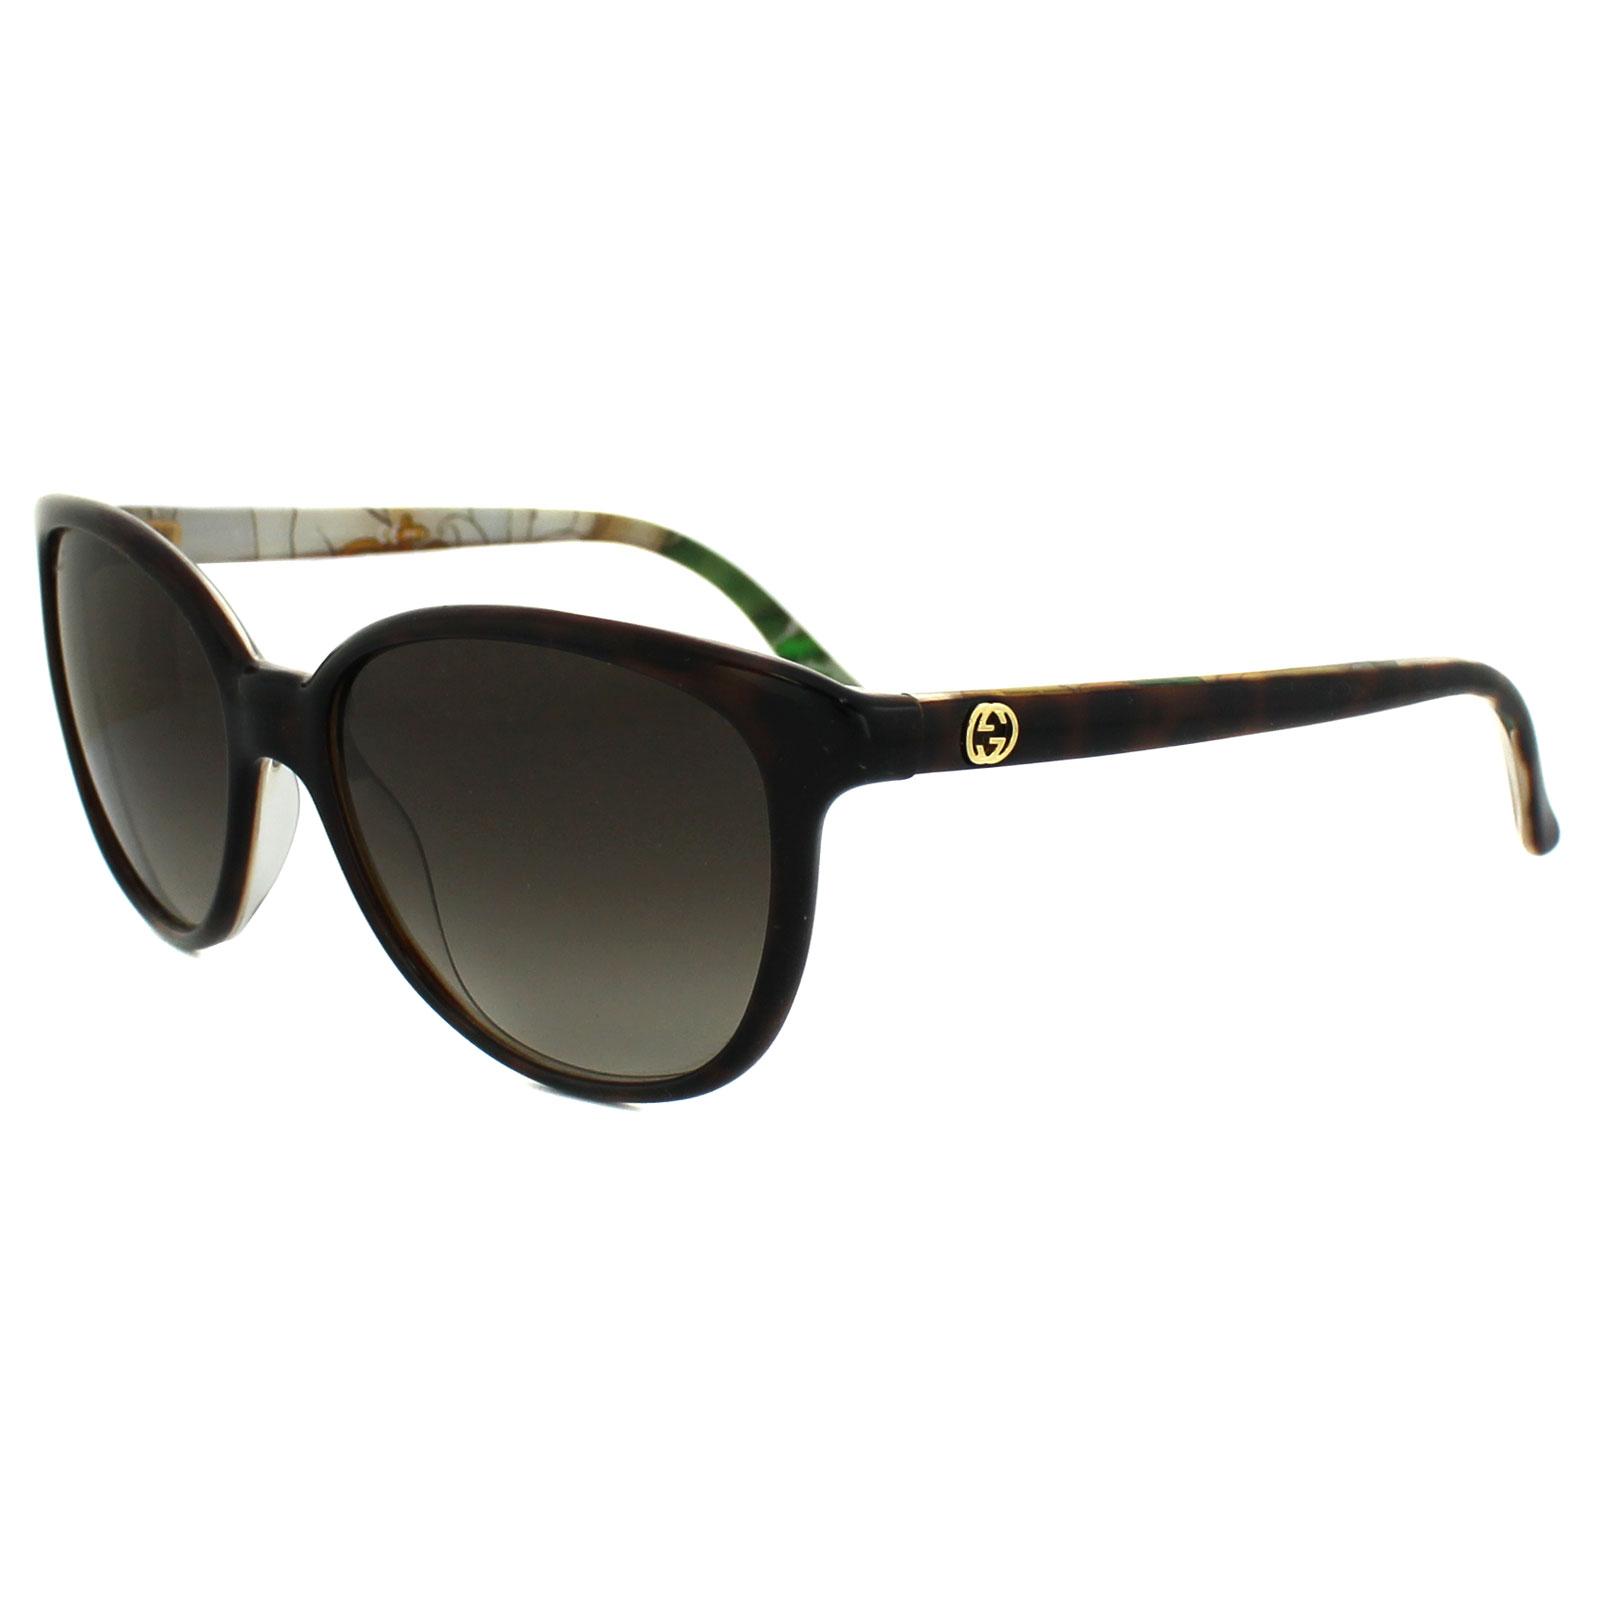 a176cc257a S Sunglasses  Cheap Gucci 3633 N S Sunglasses - Discounted Sunglasses